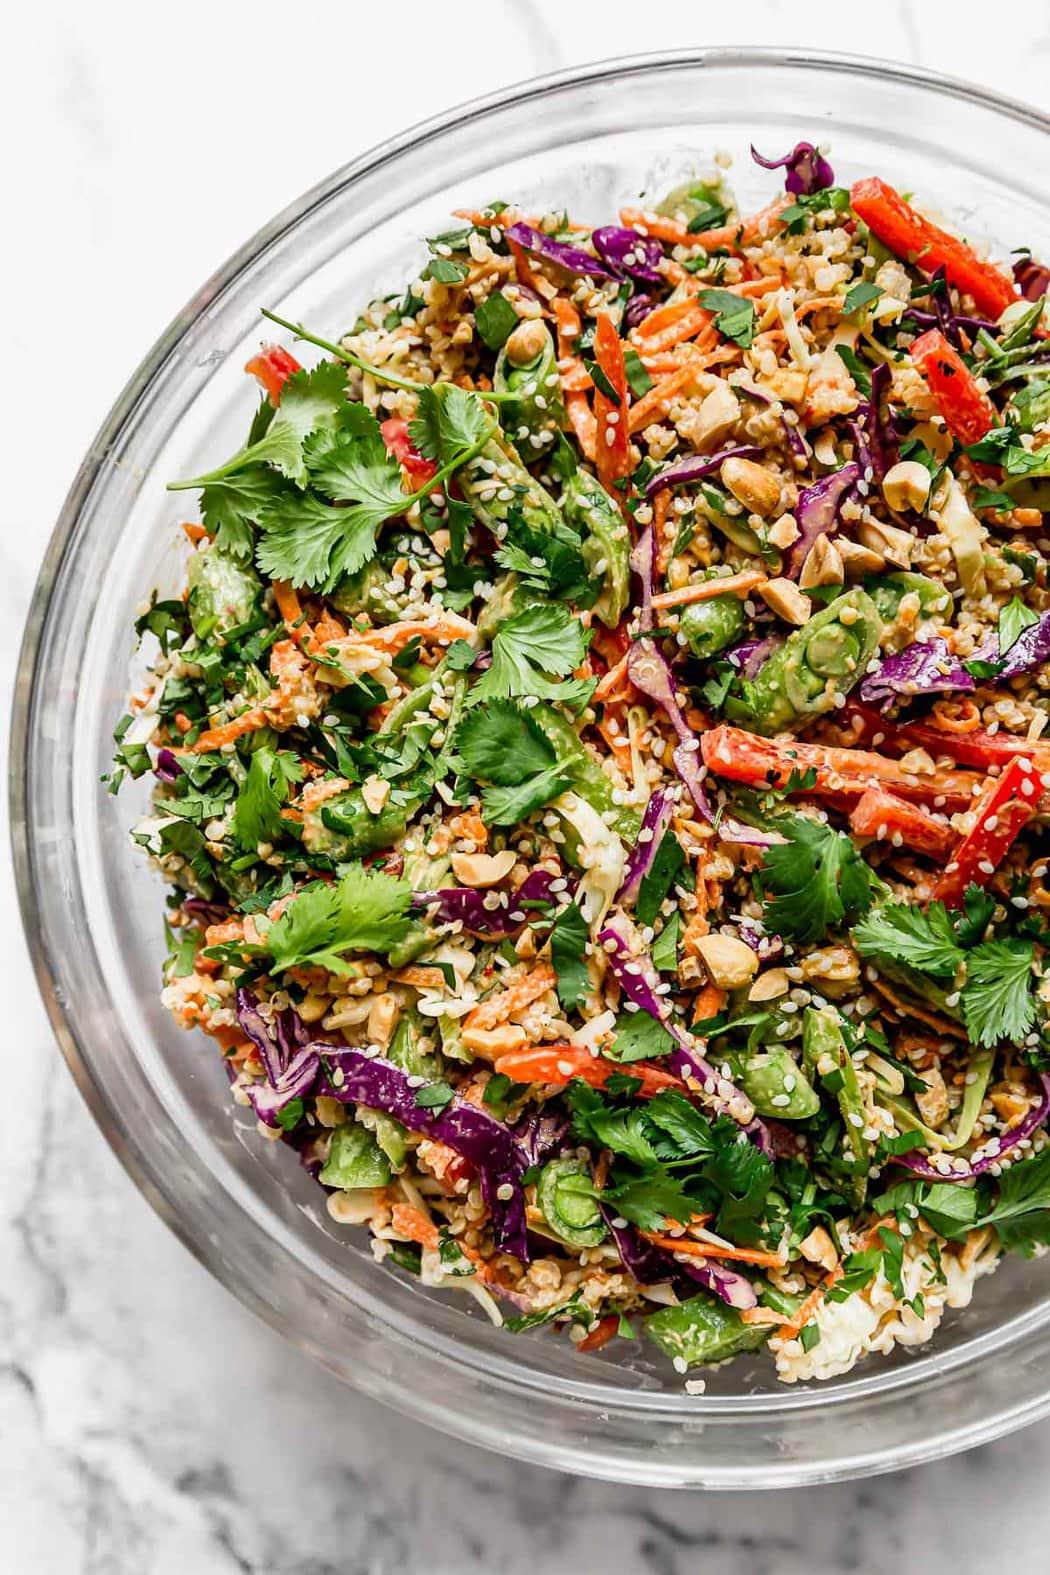 Thai Peanut Quinoa Salad Ready to Mix